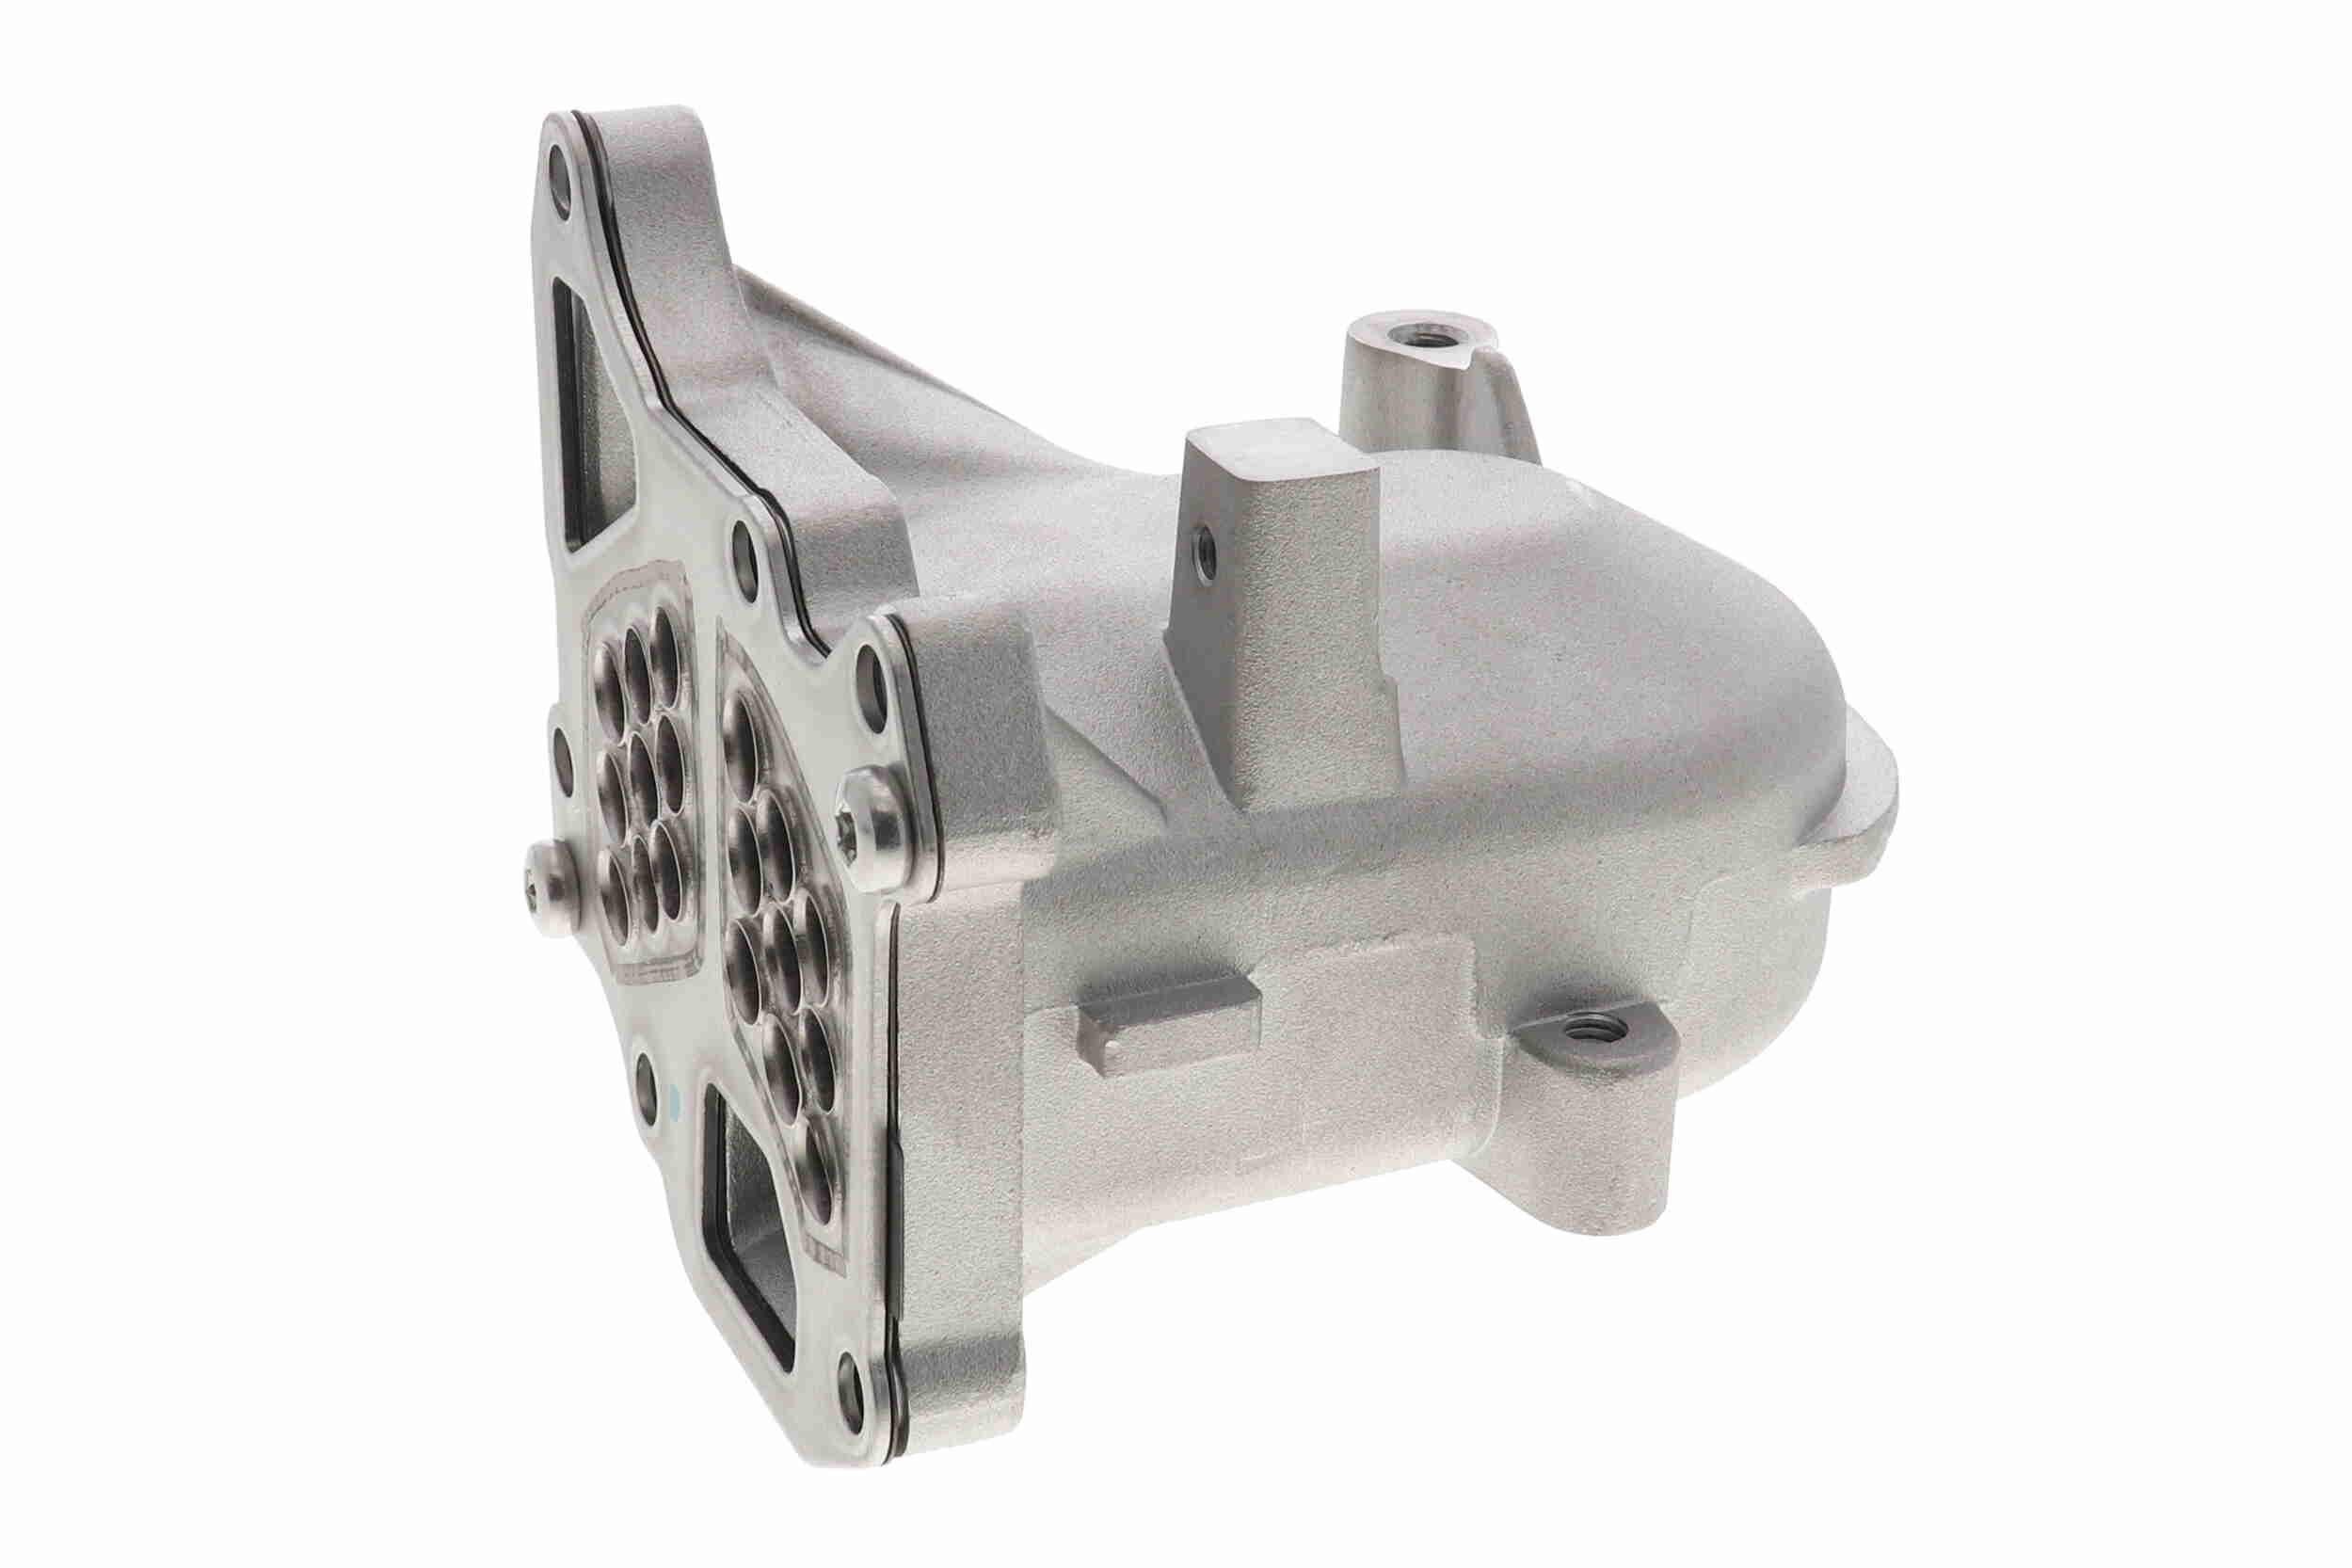 Kühler, Abgasrückführung V42-63-0010-1 — aktuelle Top OE 1618LC Ersatzteile-Angebote